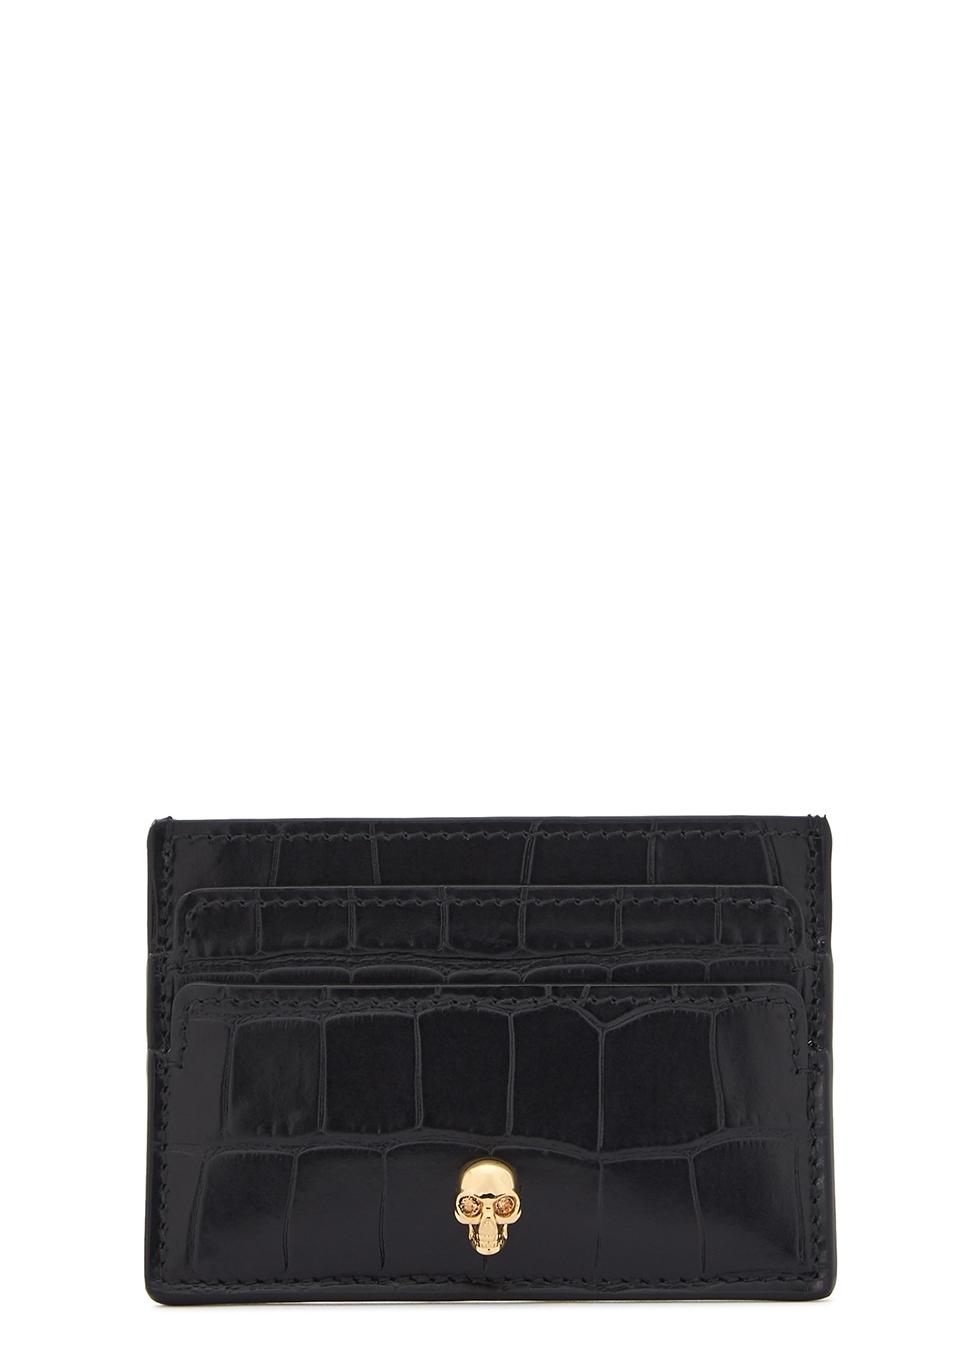 ce3ce5e6445b Women's Designer Purses and Wallets - Harvey Nichols